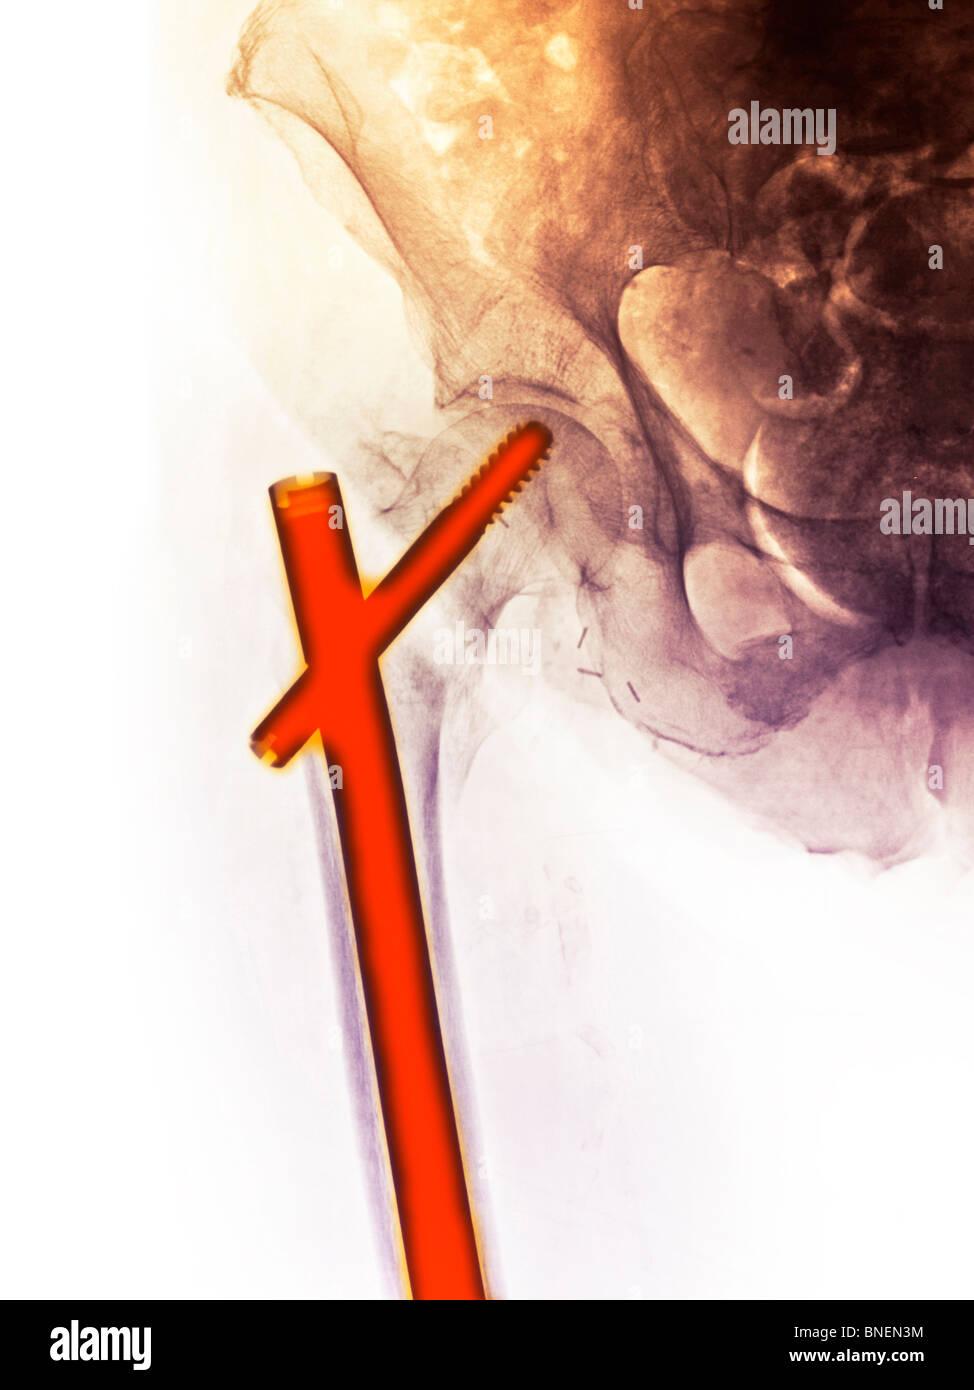 Hip Röntgen zeigt Hüftfraktur Stockfoto, Bild: 30442040 - Alamy